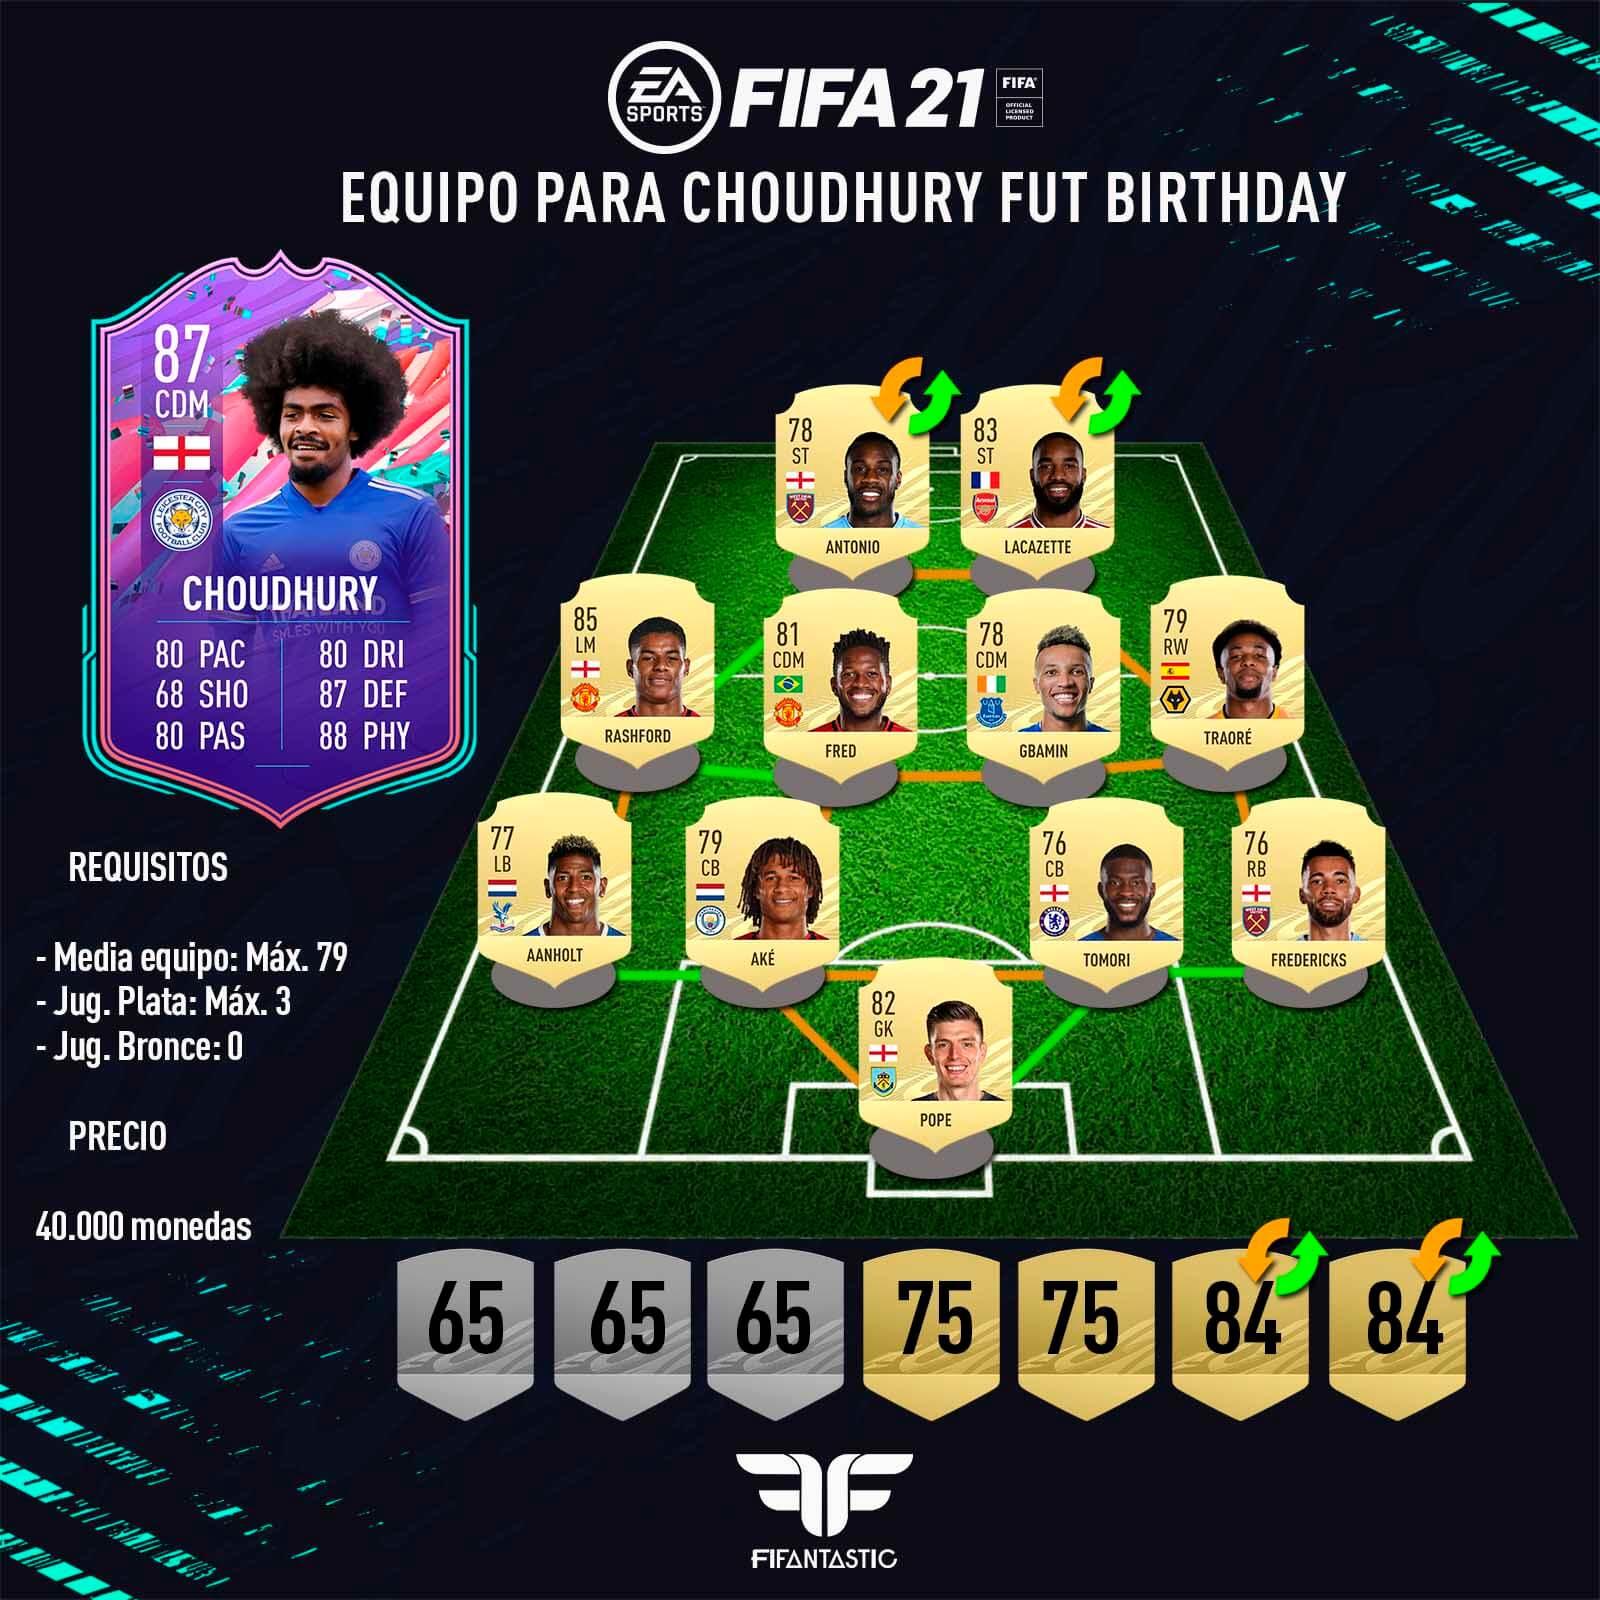 Equipo para Choudhury FUT Birthday en FIFA 21 Ultimate Team